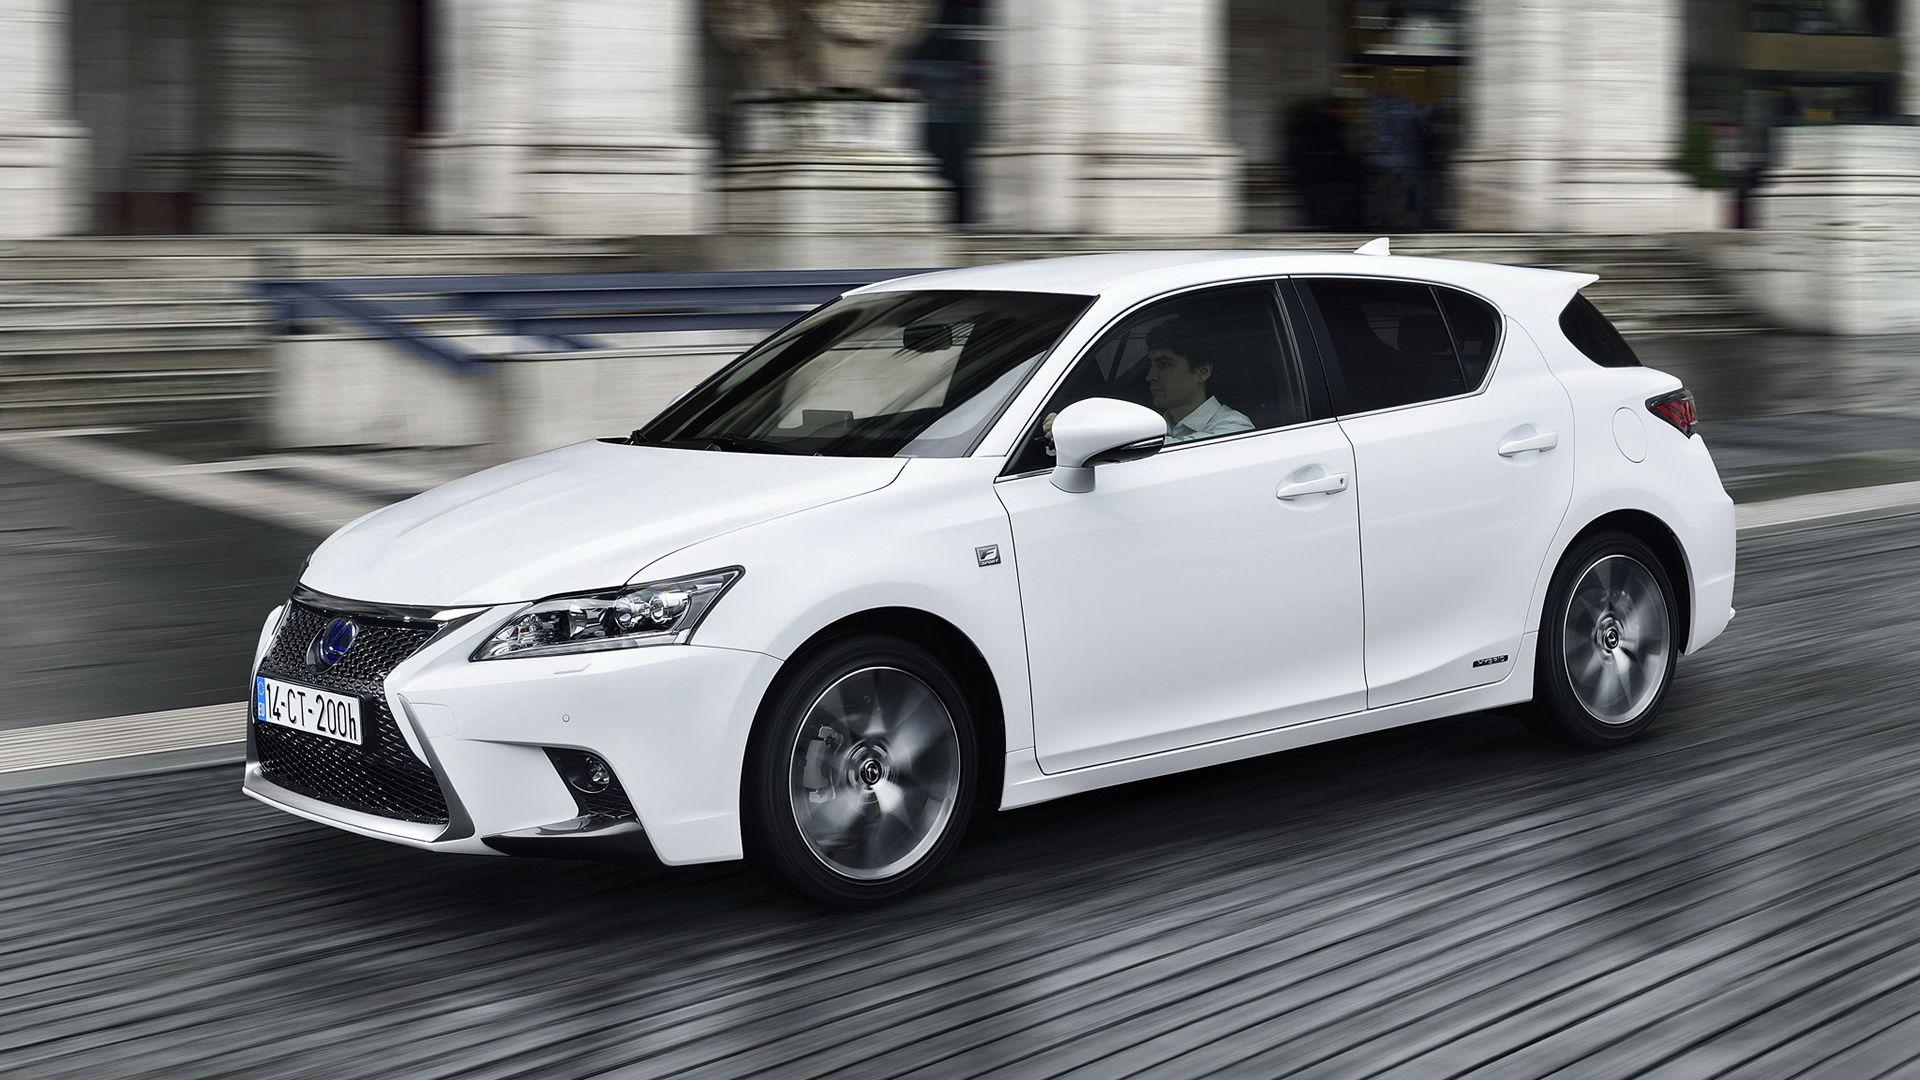 Lexus ct 200h f sport wallpaper hd 12880